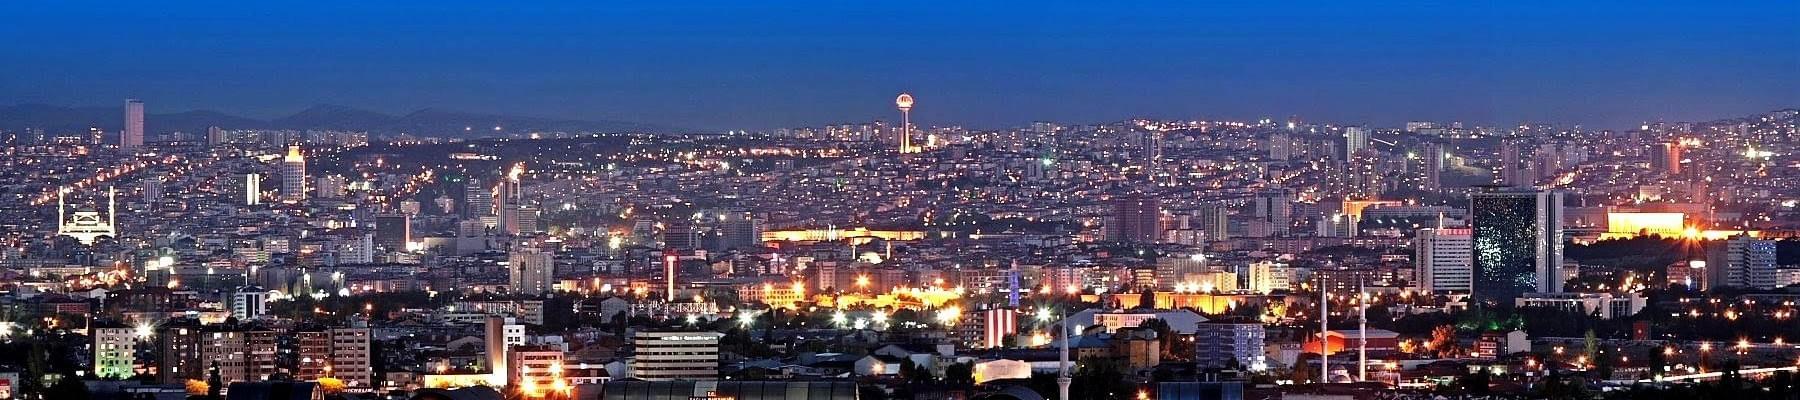 Об Анкаре